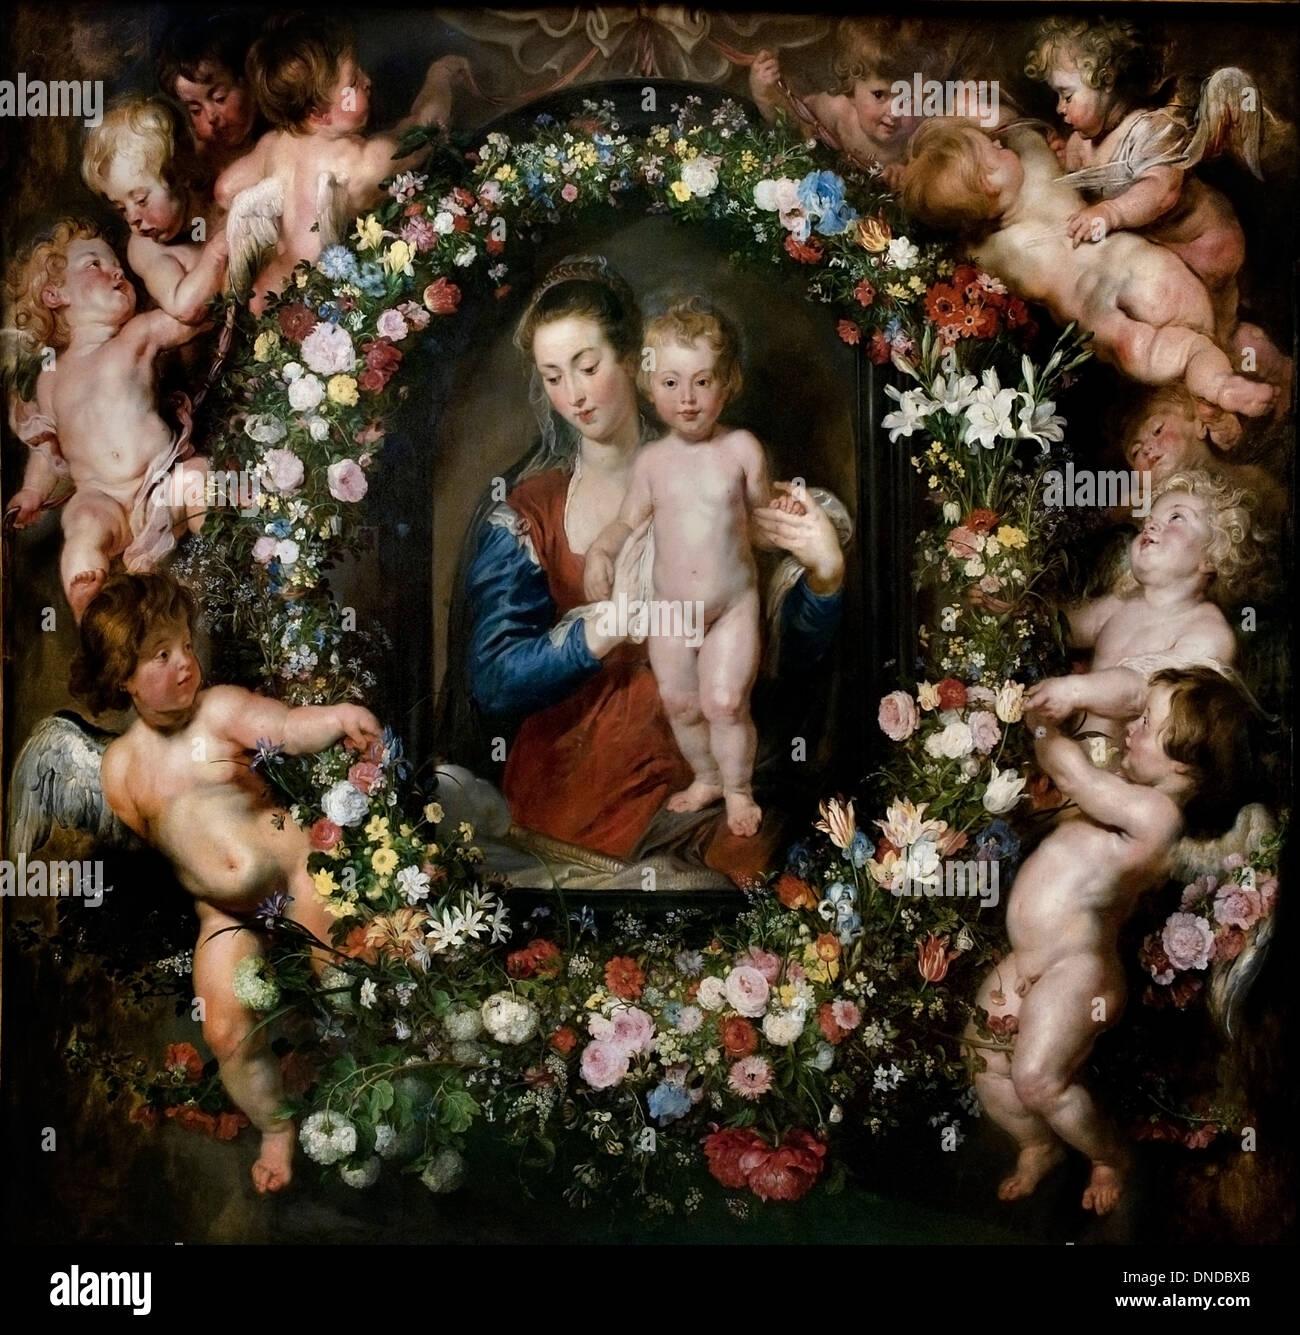 Rubens painted the figures and Brueghel the garland 1616 Peter Paul Rubens and Jan Brueghel the Elder  (1568-1625) Flemish Belgi - Stock Image